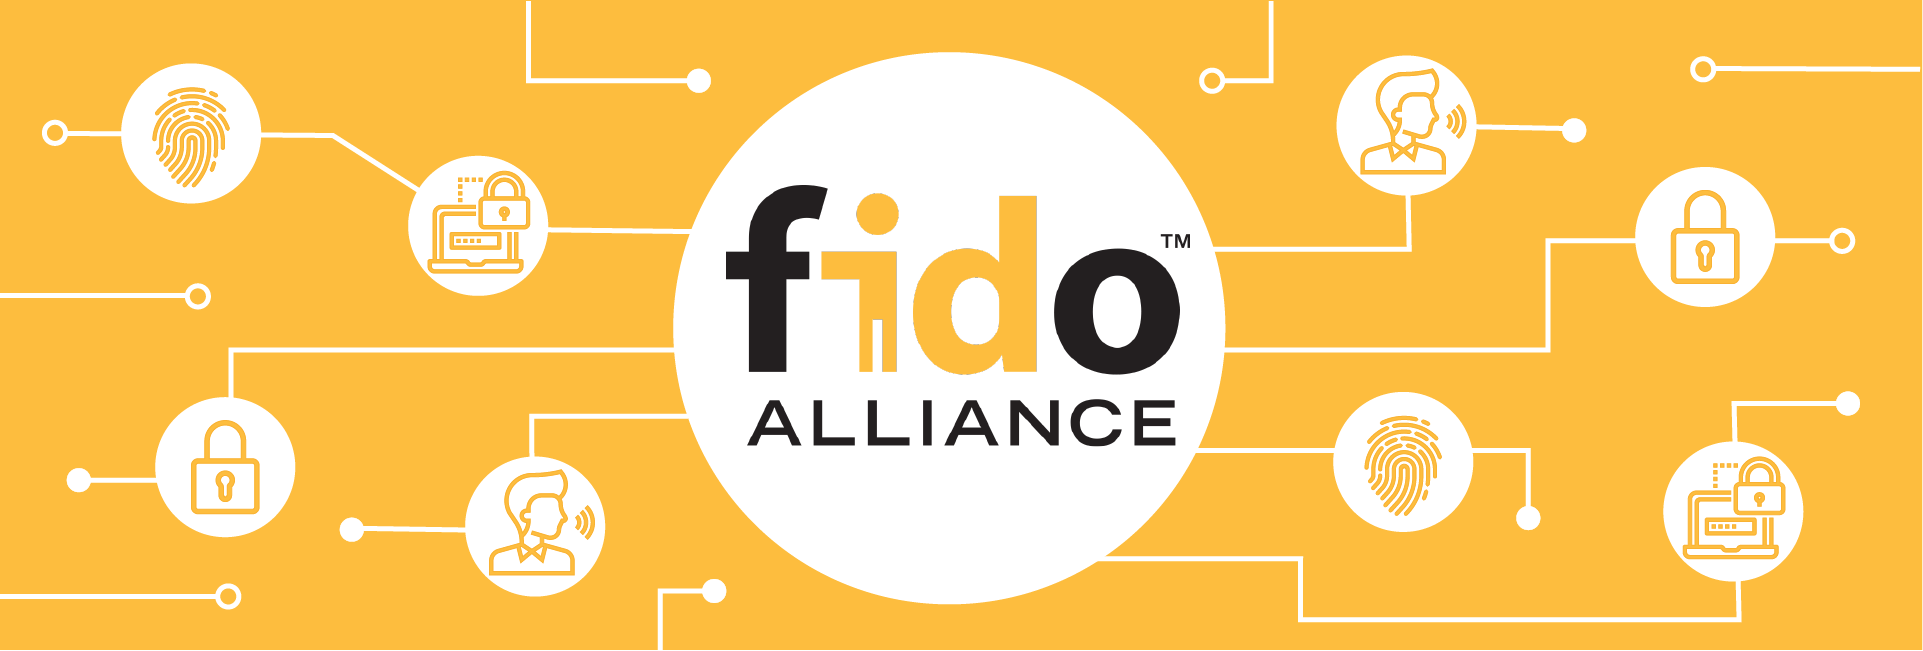 Razvoj napredne zaštite – FIDO alijansa